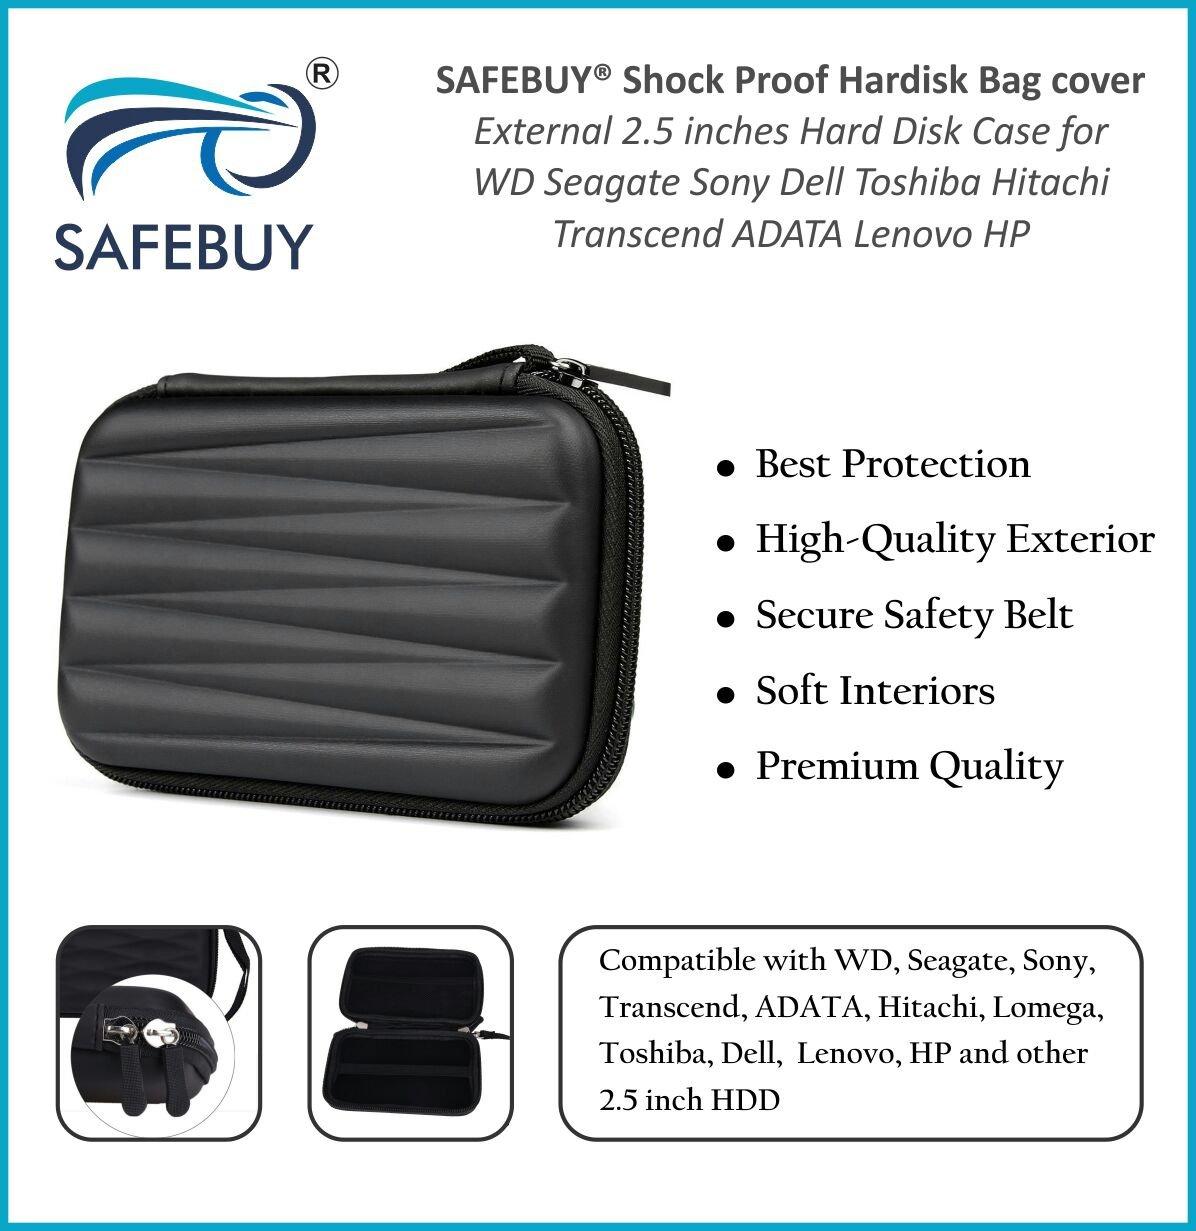 Buy Safebuy External Hard Disk Case 25 Inch Black Pouch Harddisk Online At Low Prices In India Safebuytm Reviews Ratings